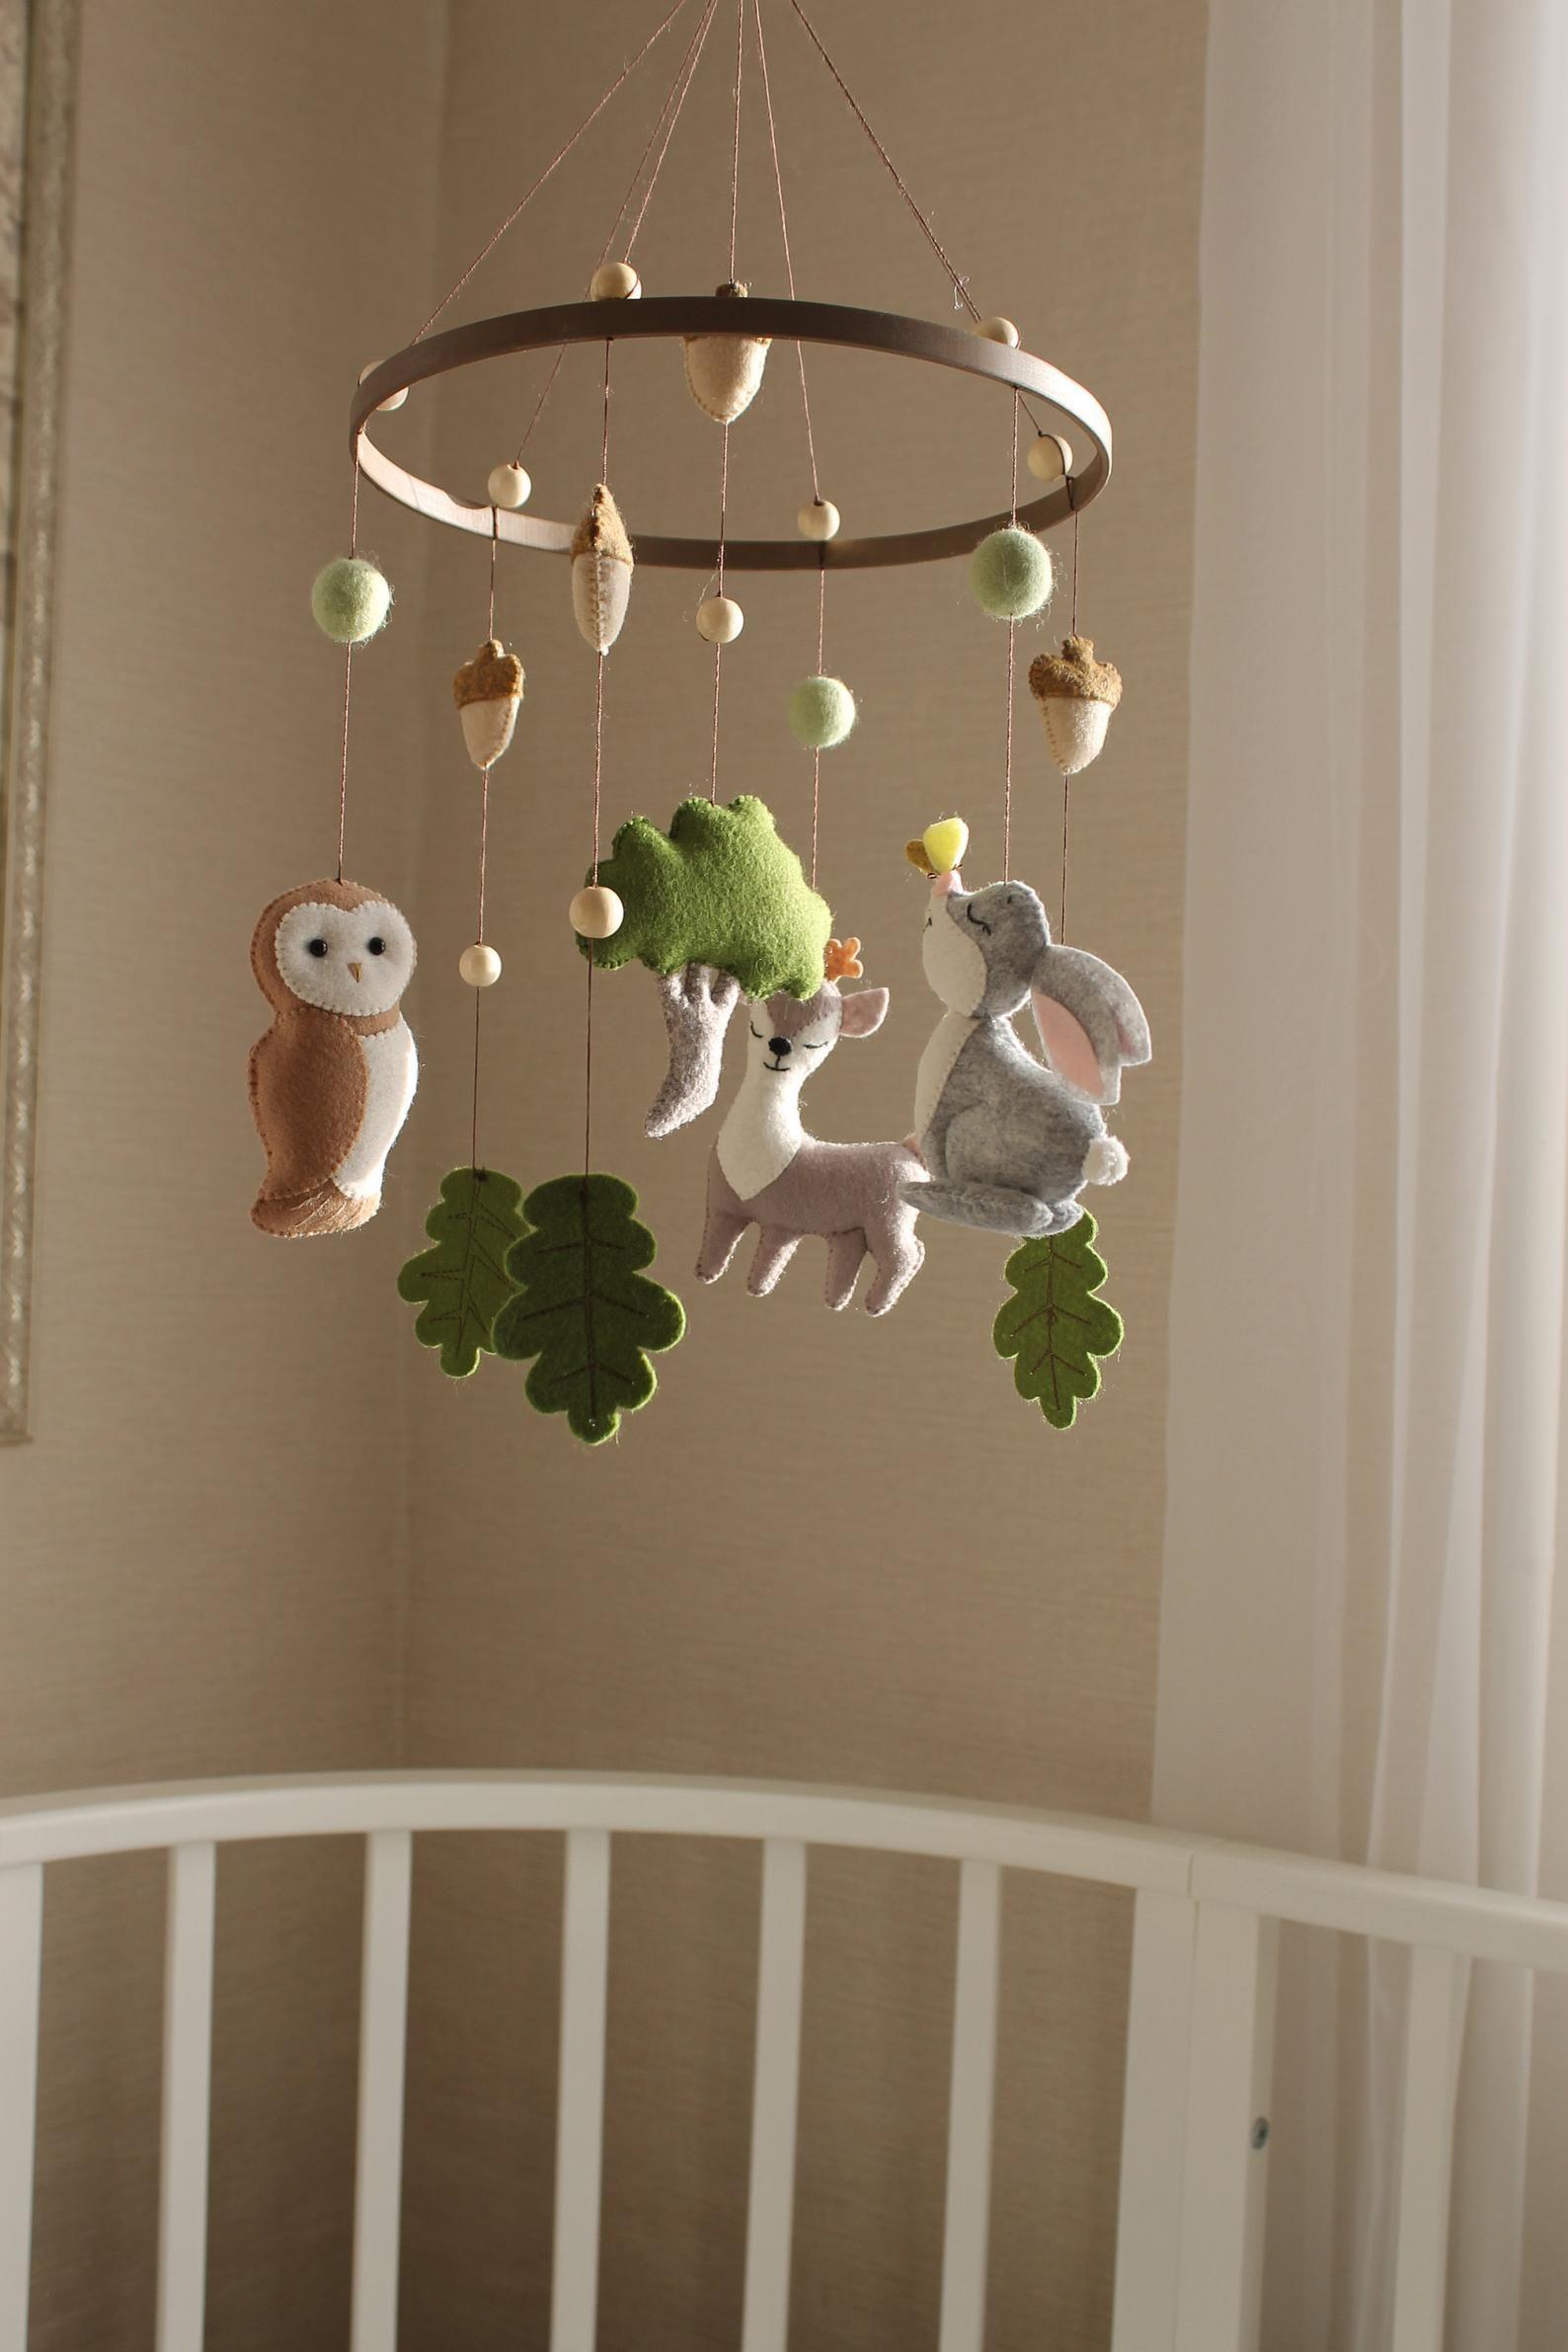 Mobiles Kids Room Baby Mobile Wall Hanging Decoration Felt Mobile for Baby Baby Pendant Felt name banner Nursery Decor Baby Mobiles